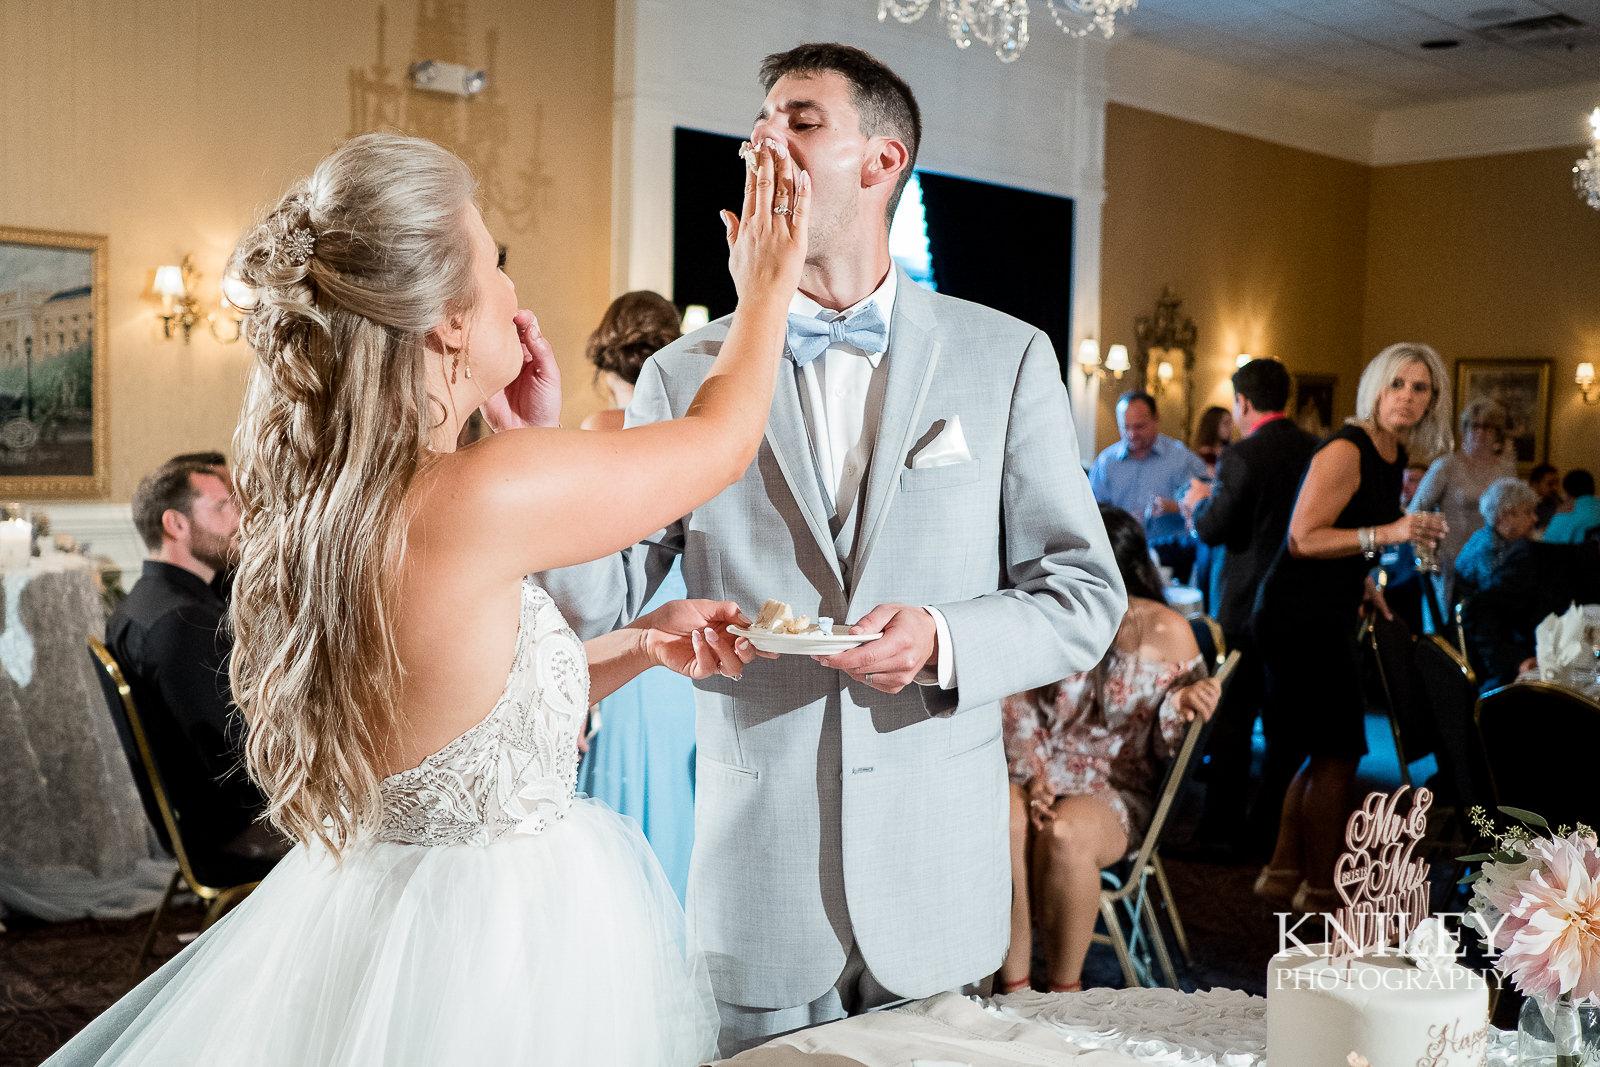 094 - Buffalo NY wedding pictures - Sean Patrick Restaurant Wedding Reception - Getzville - XT2B9414.jpg